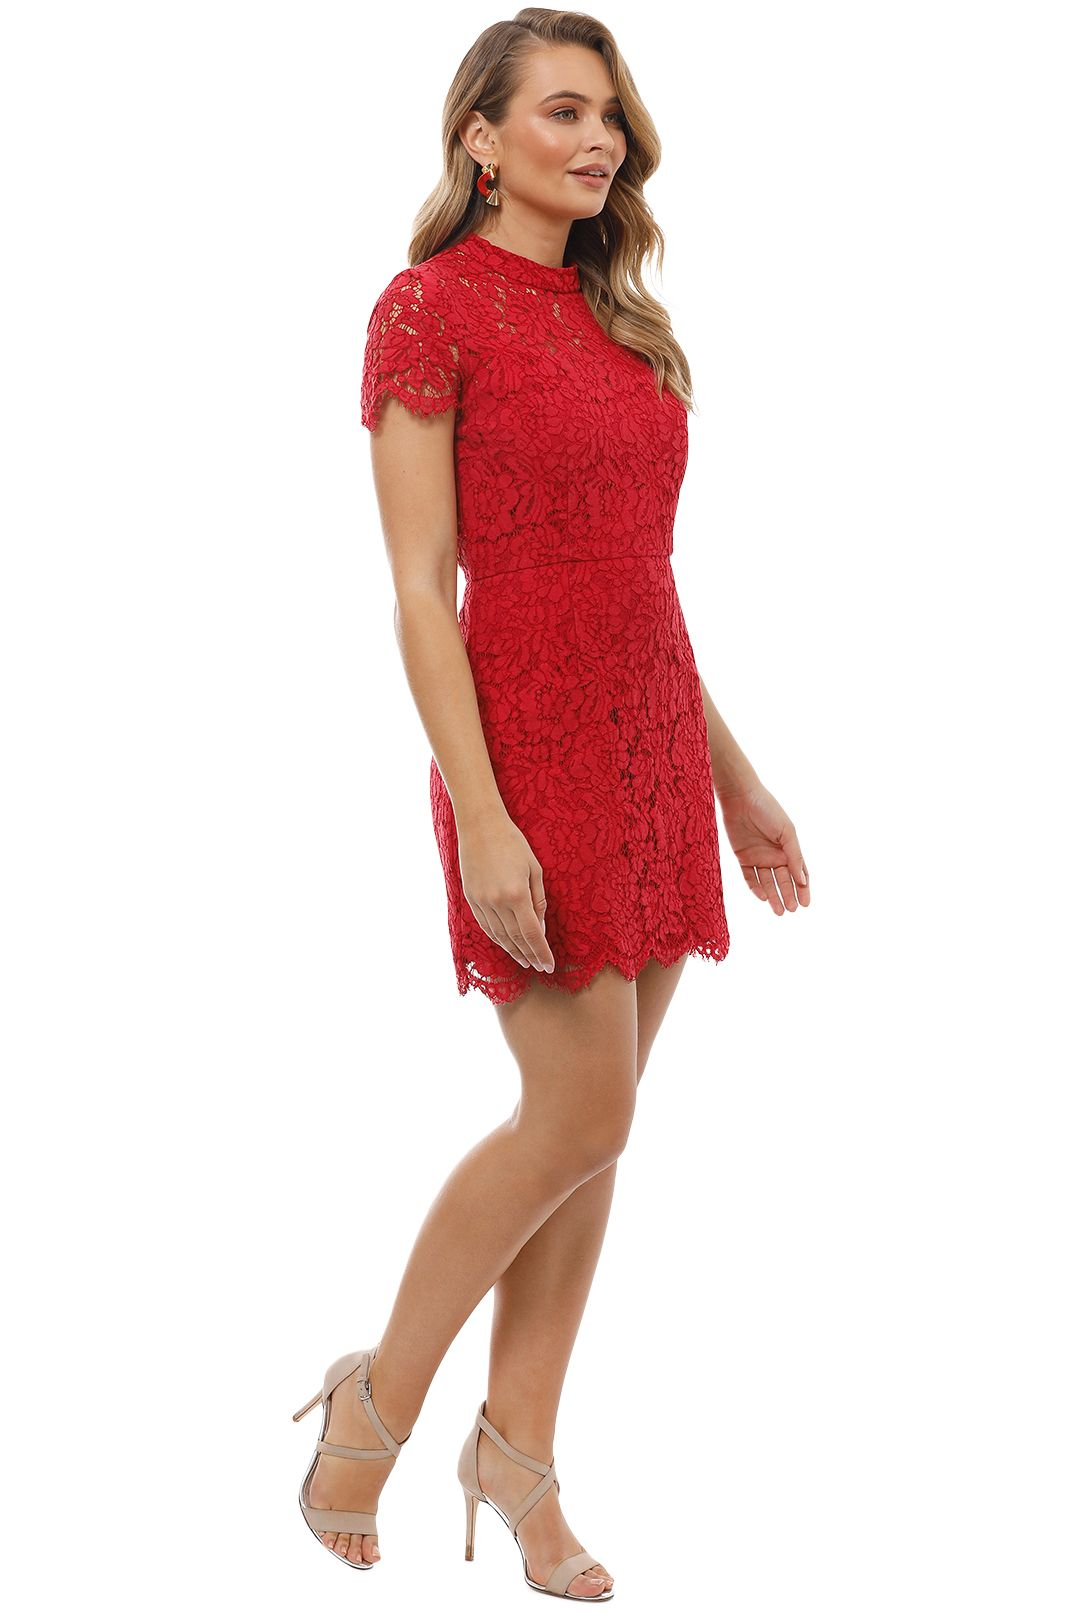 Maison Vivienne - Bitter Sweet High Neck Mini Dress - Red - Side